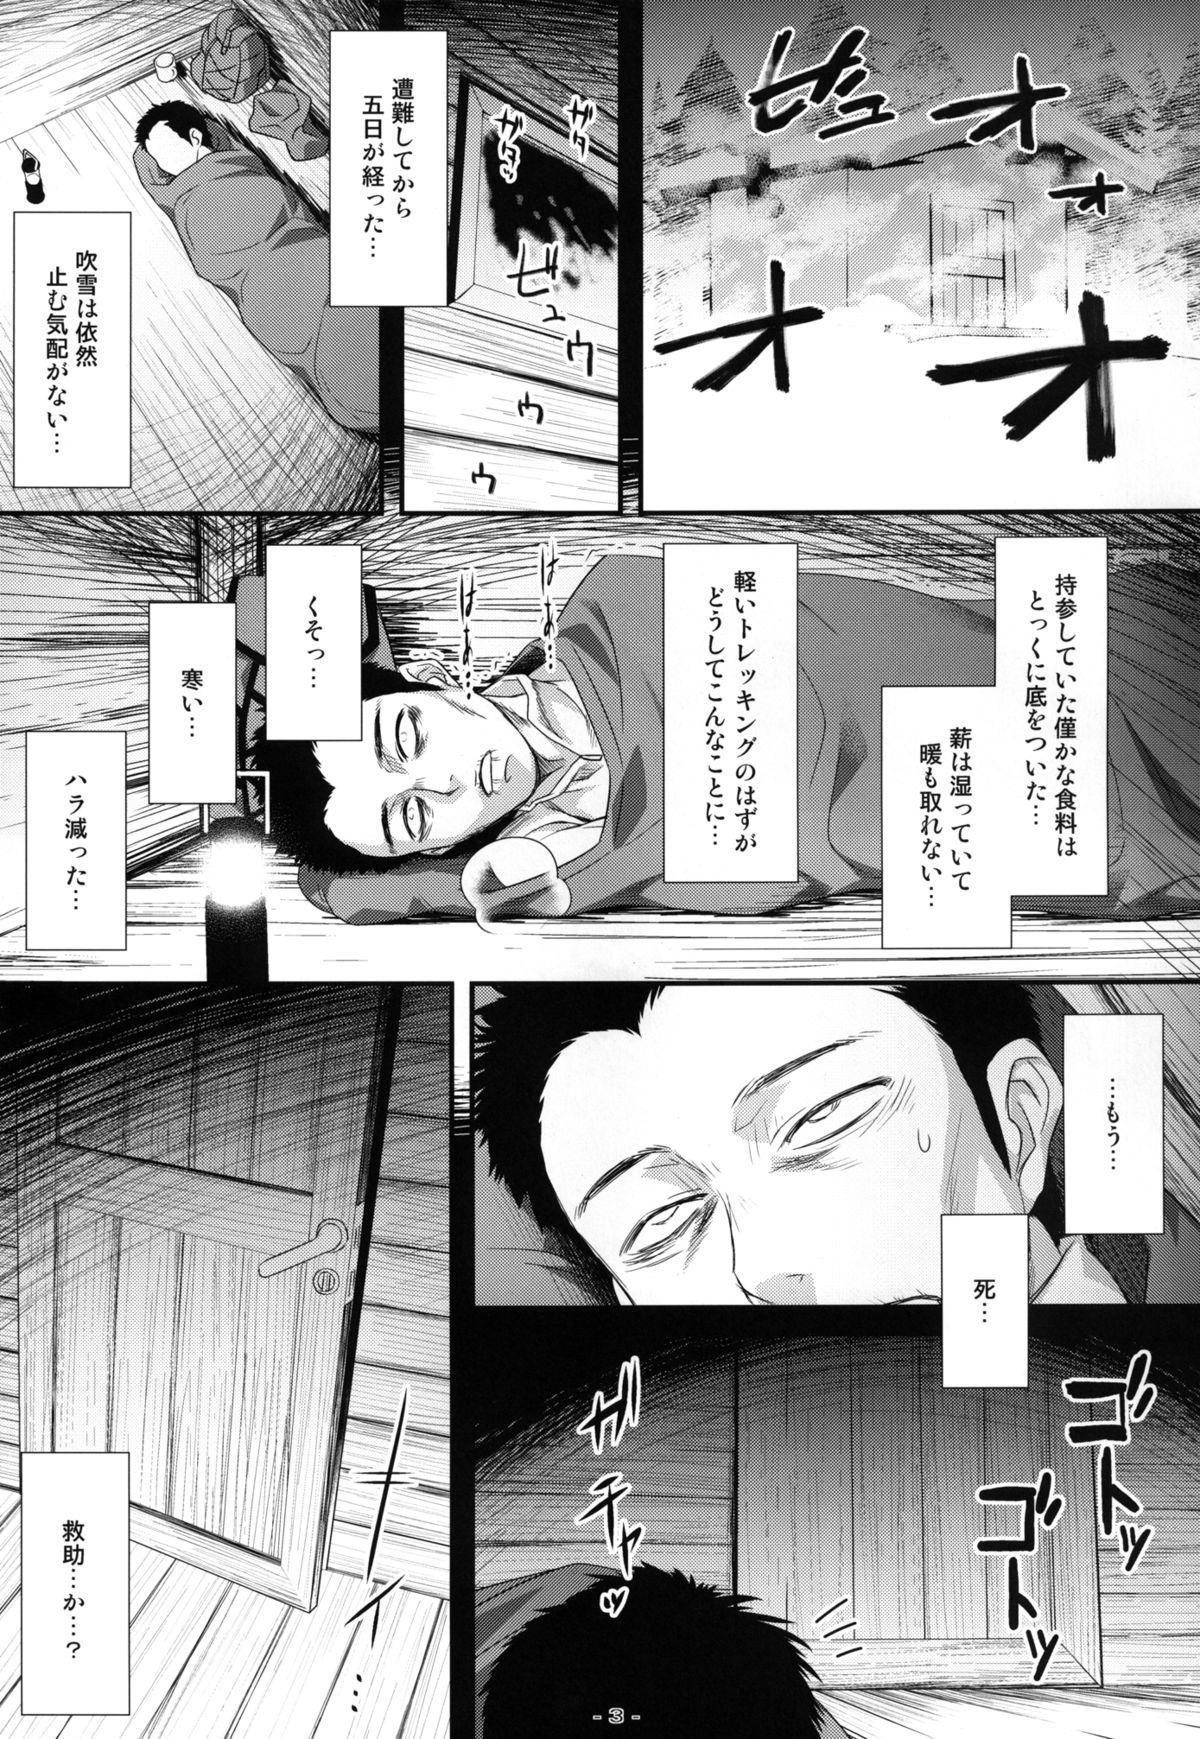 Yasei no Chijo ga Arawareta! 6 | A Wild Nymphomaniac Appeared! 6 1